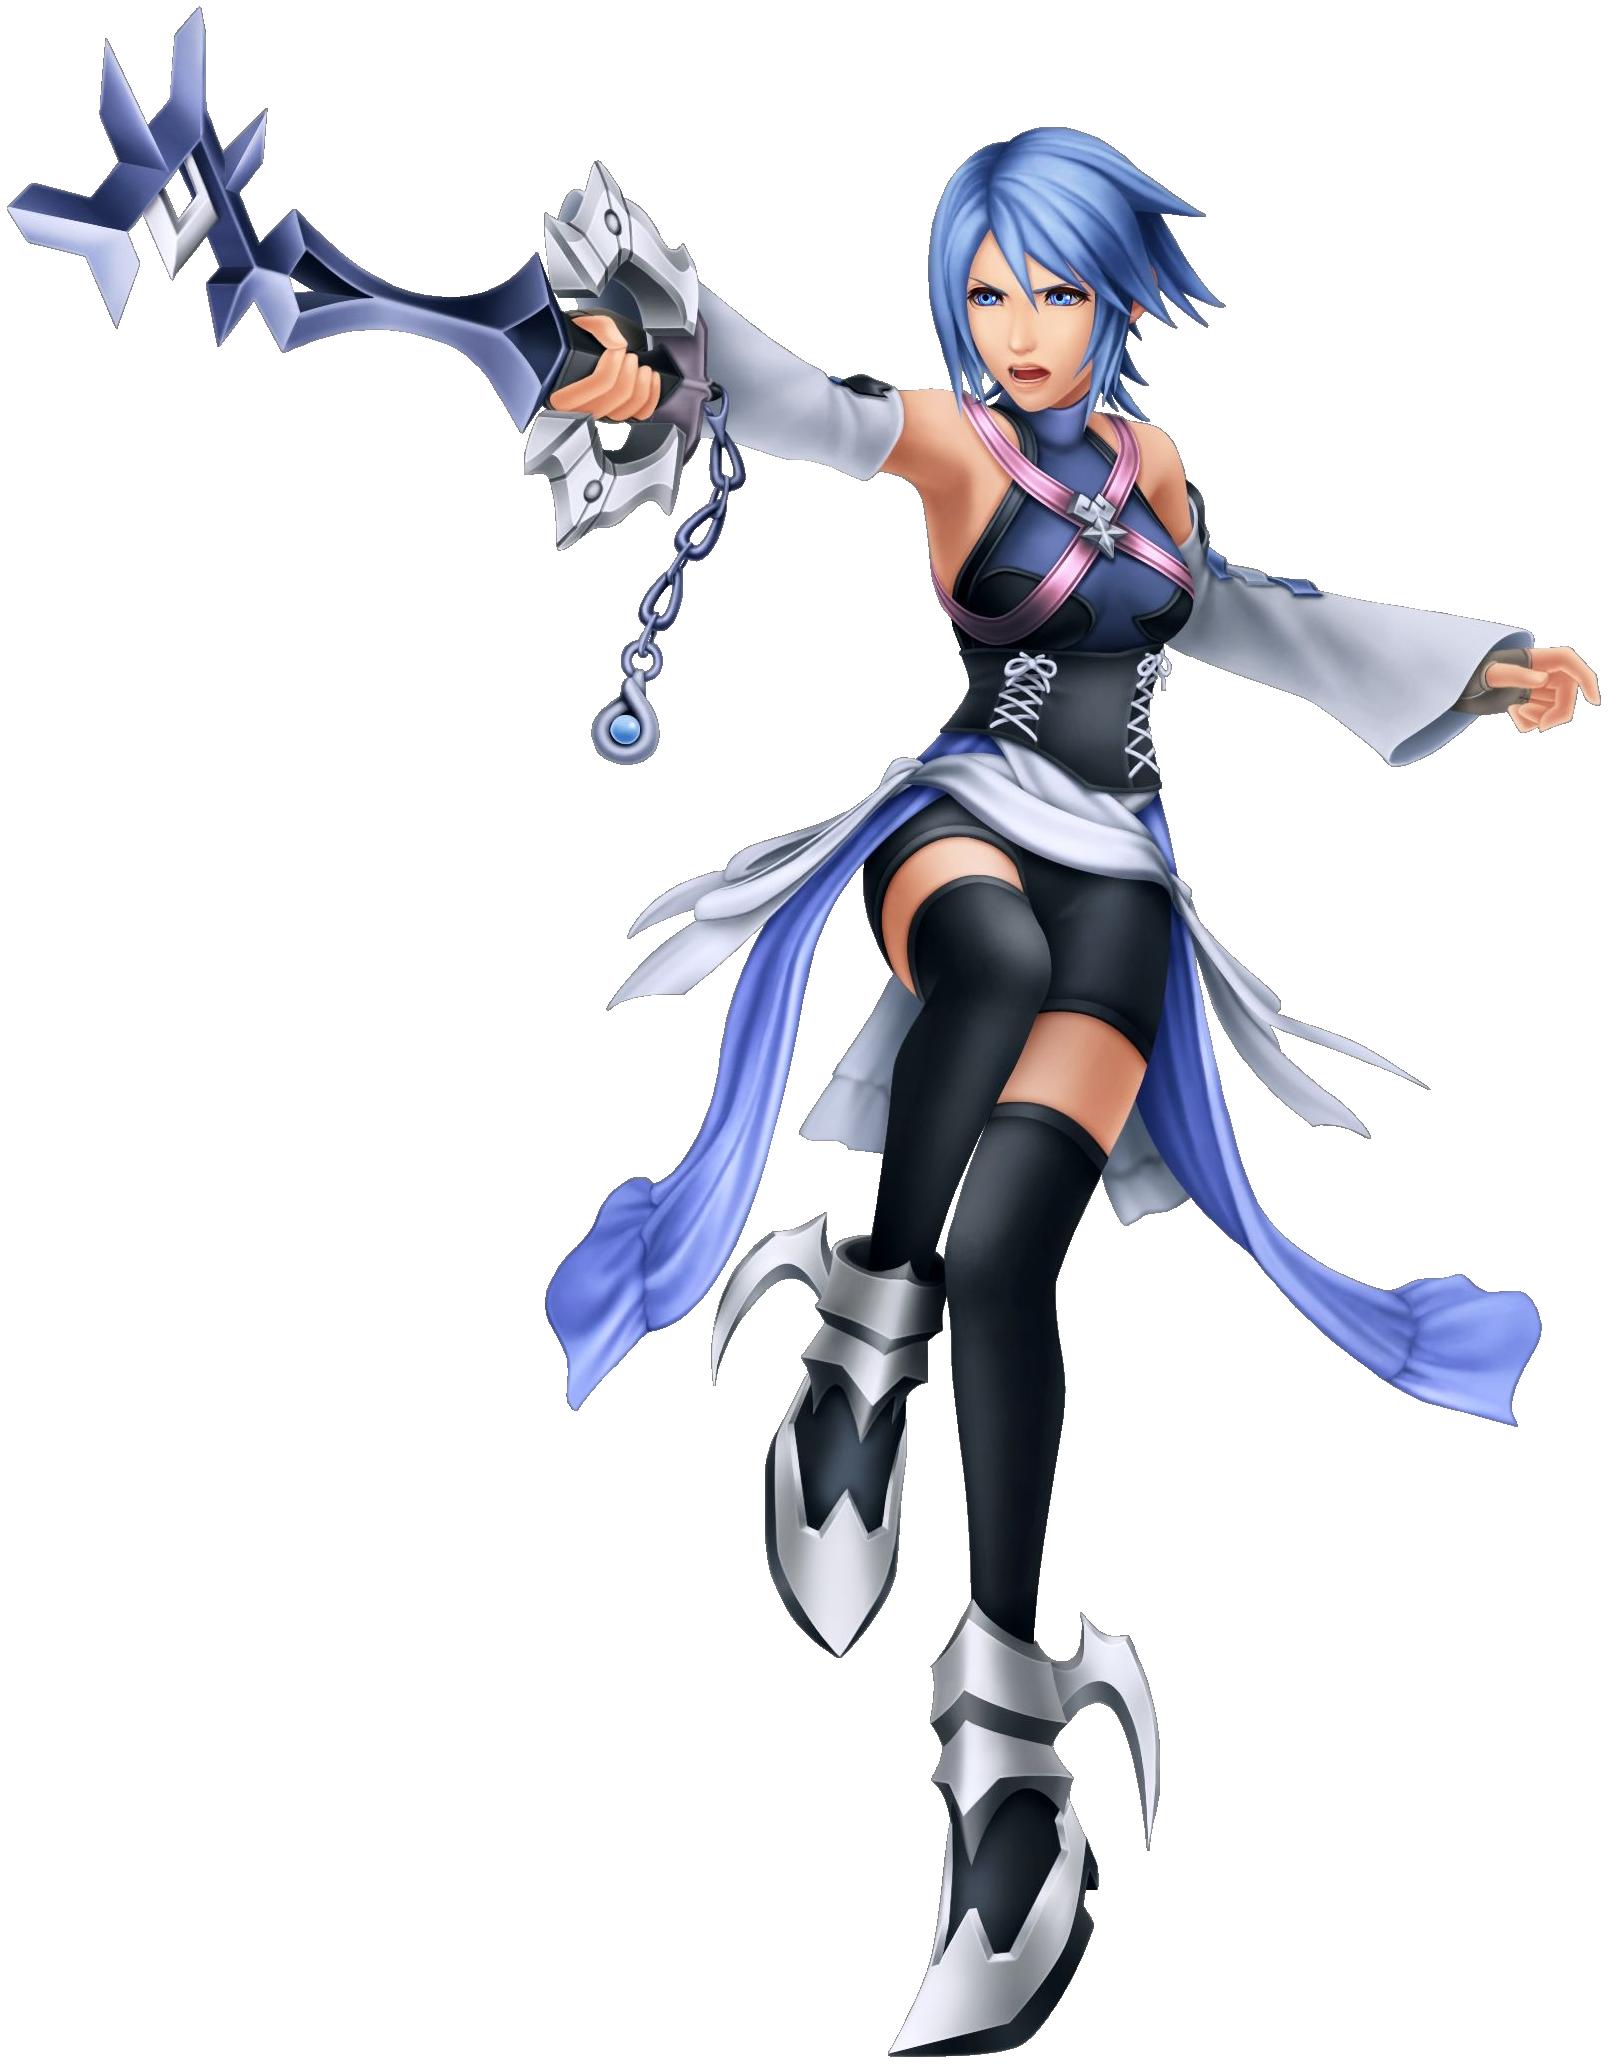 Aqua Kingdom Hearts Vs Battles Wiki Fandom Powered By Wikia